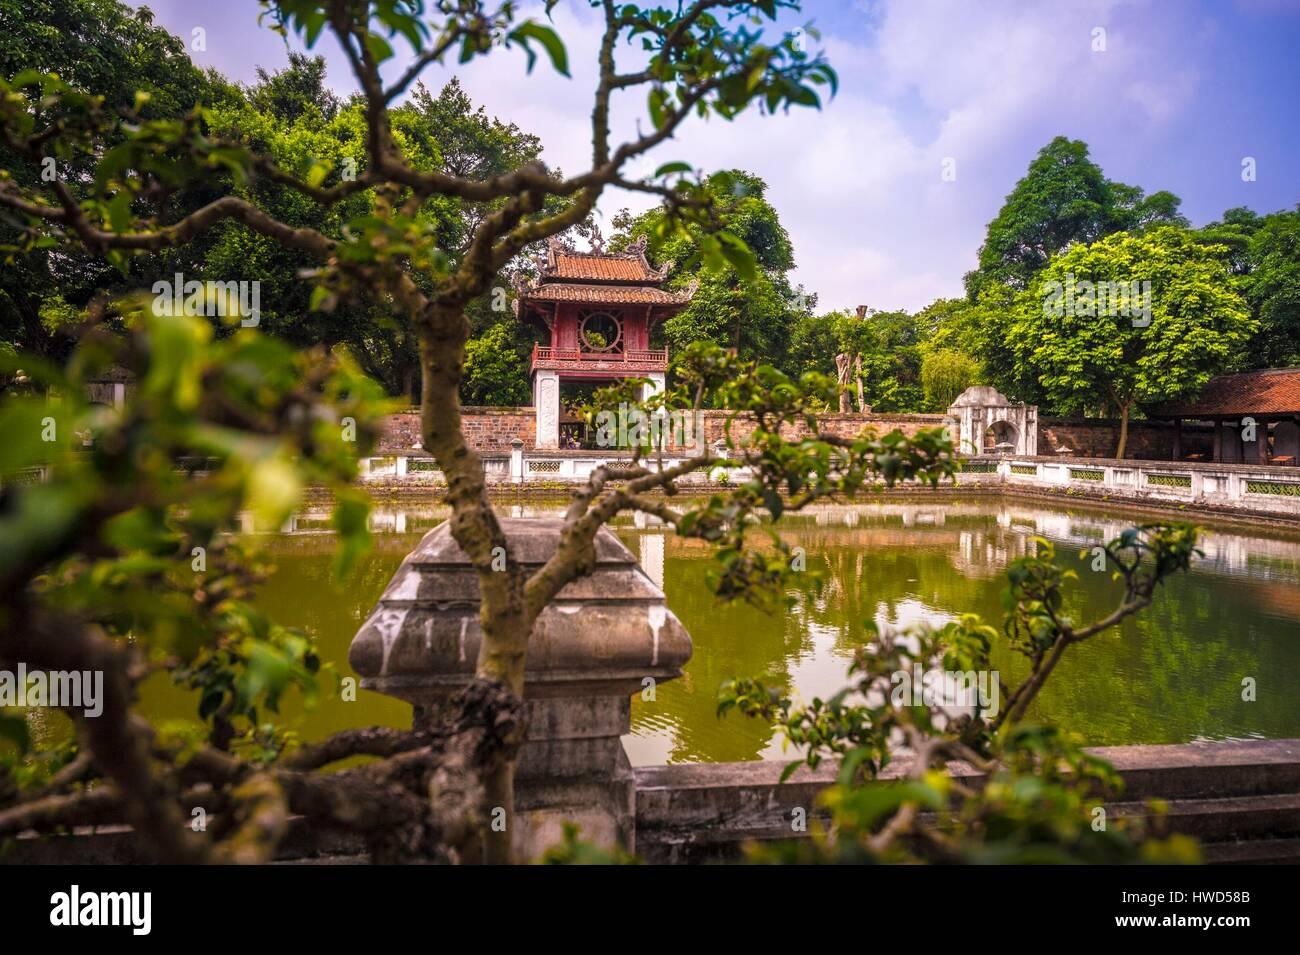 Vietnam, Red River Delta, Hanoi, sanctuary of Prince propagator of Letters (Van Vuong Tuyen Mieu) Temple of Literature Stock Photo